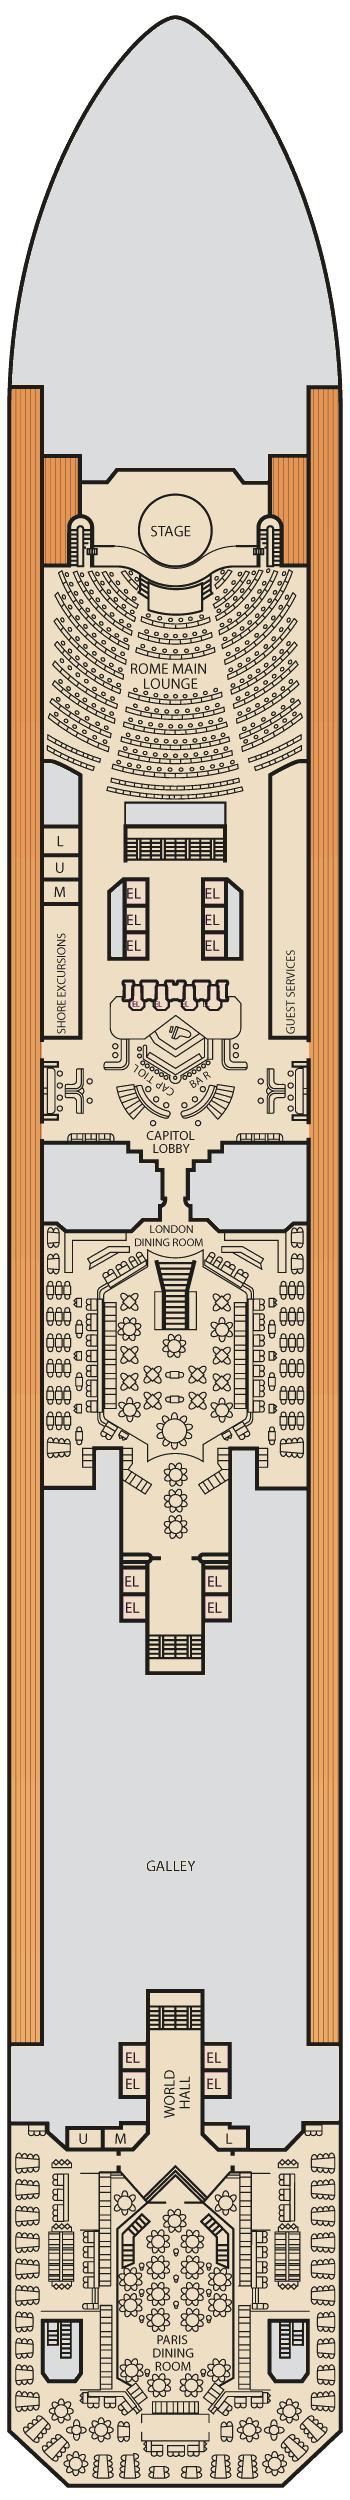 Carnival Triumph - Lobby Deck